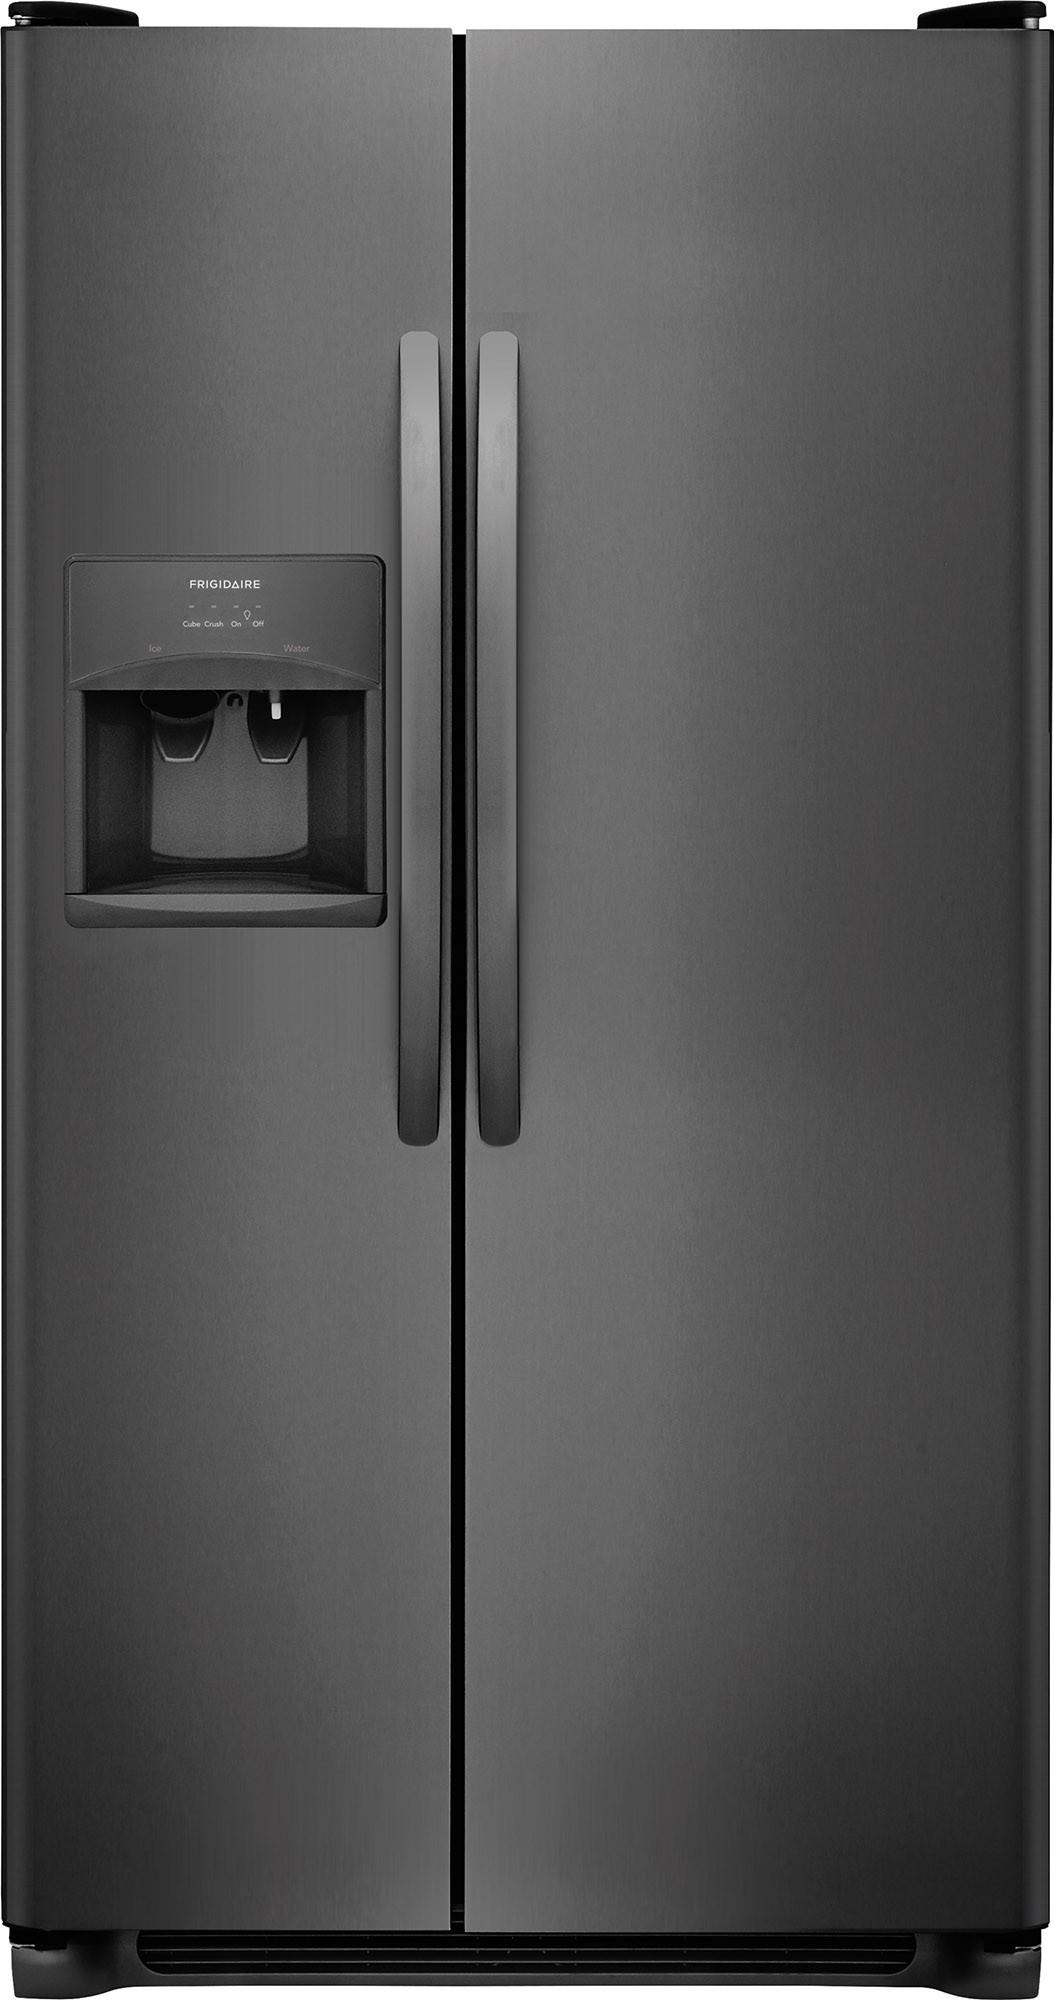 Side By Side Refrigerators: Black, White, Other Fridges by AJ Madison